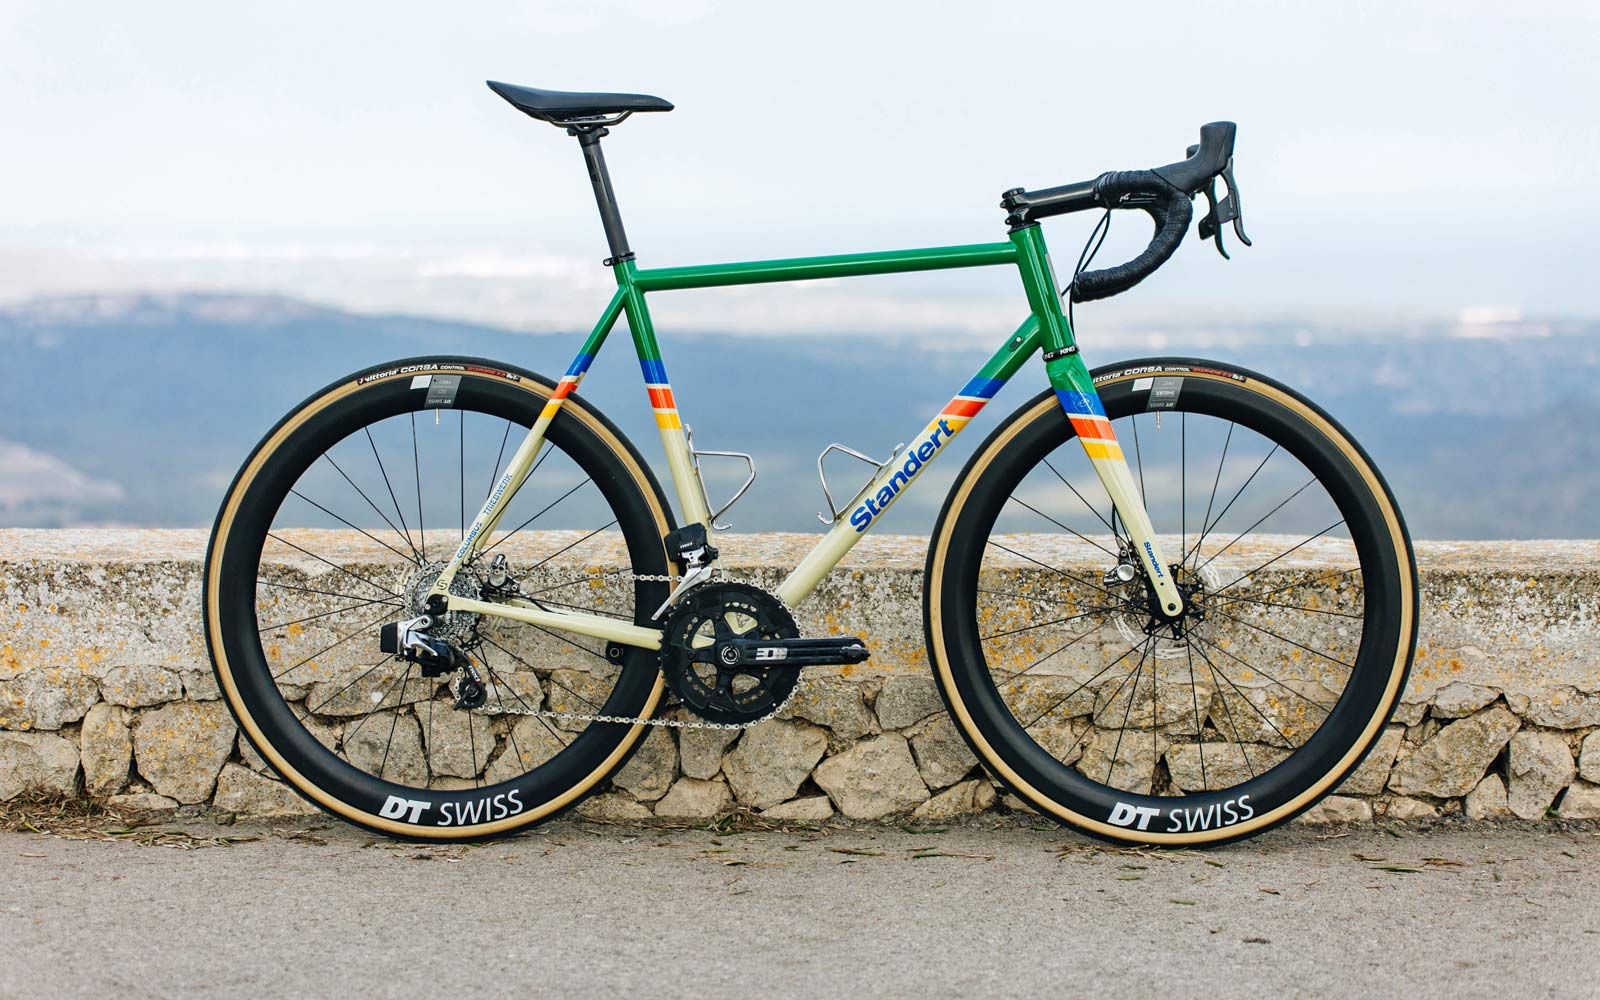 Standert Triebwerk Disc updates modern steel road bike, adds new LTD edition